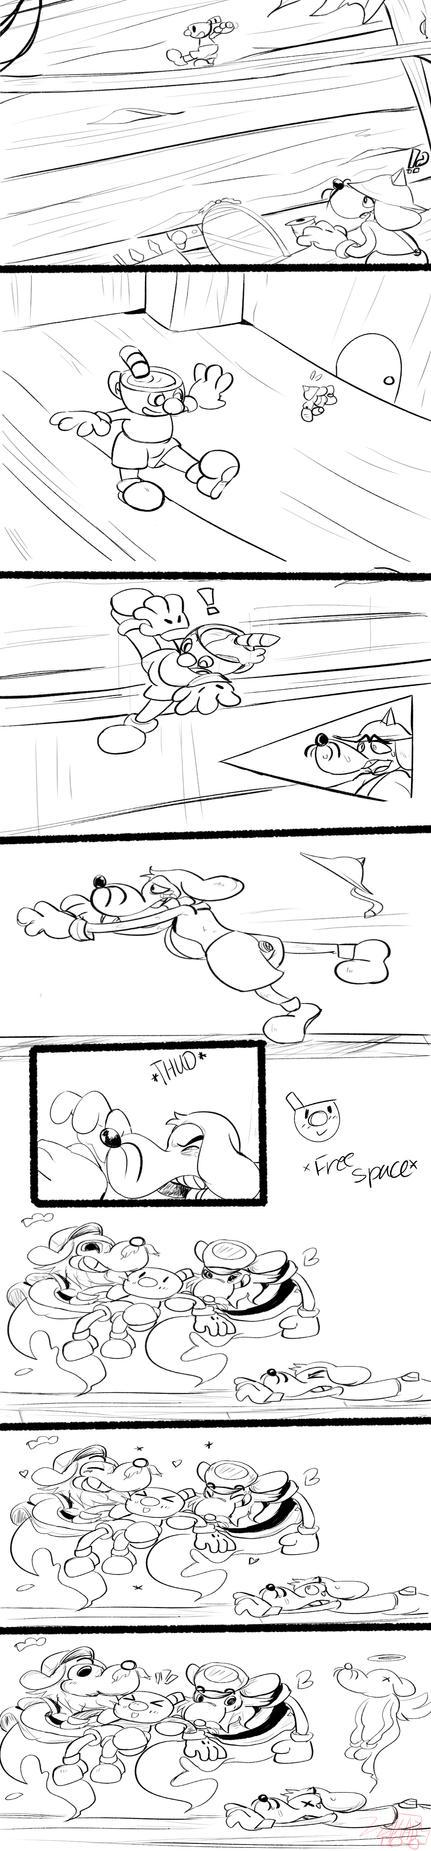 Mugman Stunts Com by brow9637